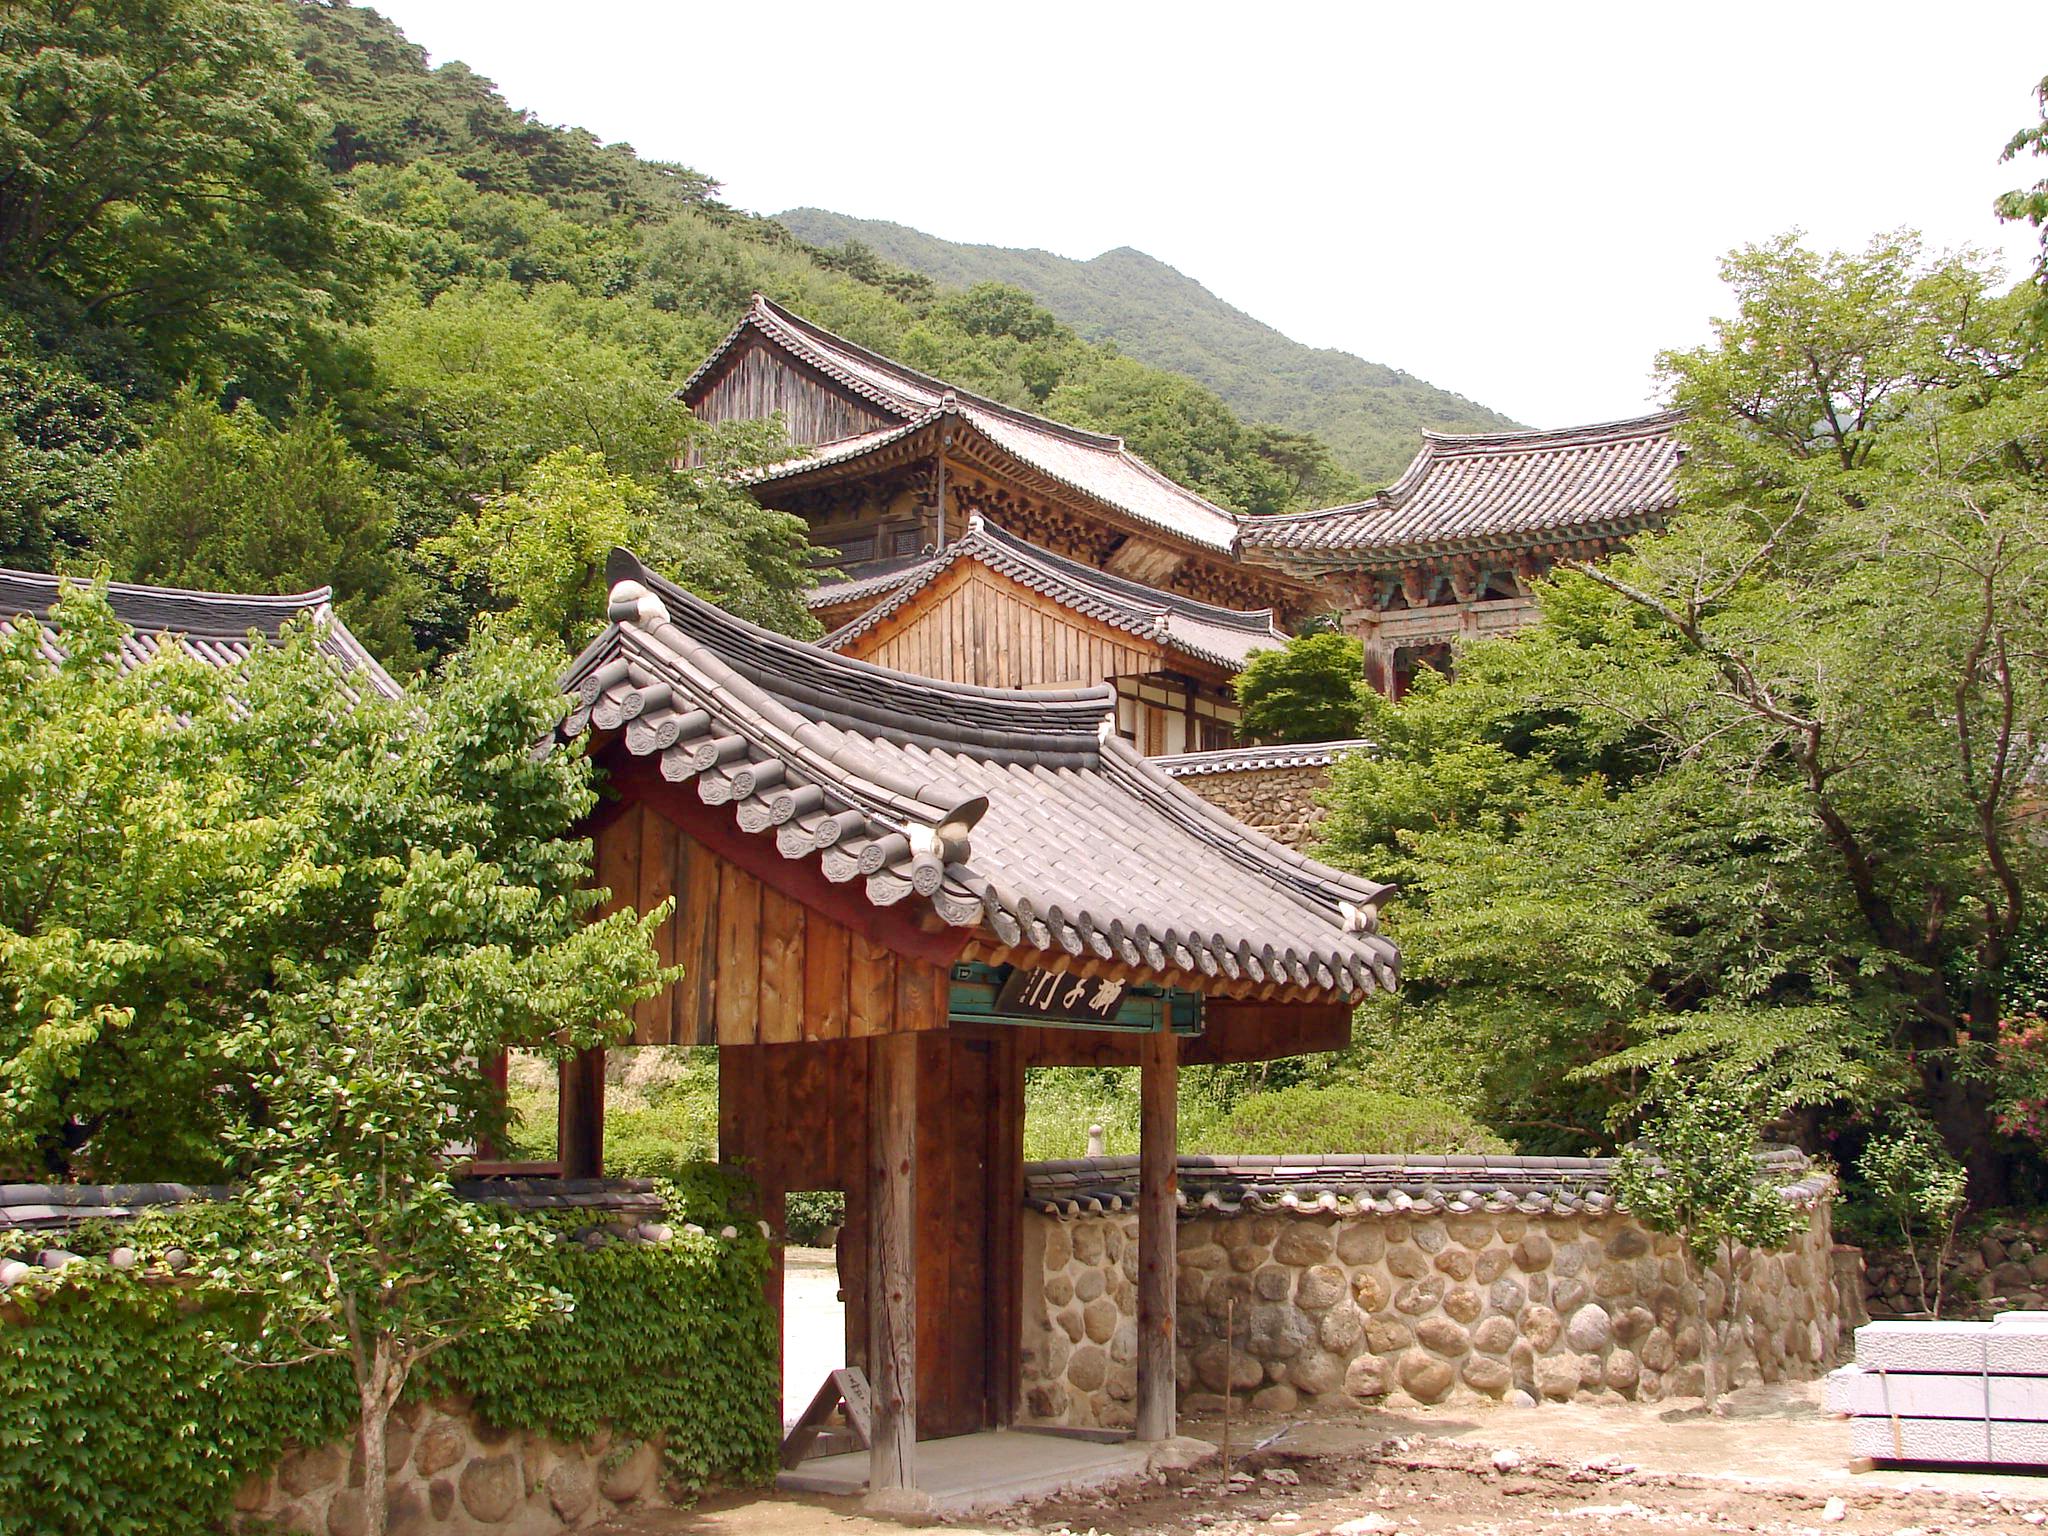 Korea-Gurye-Hwaeomsa_4989-06.jpg